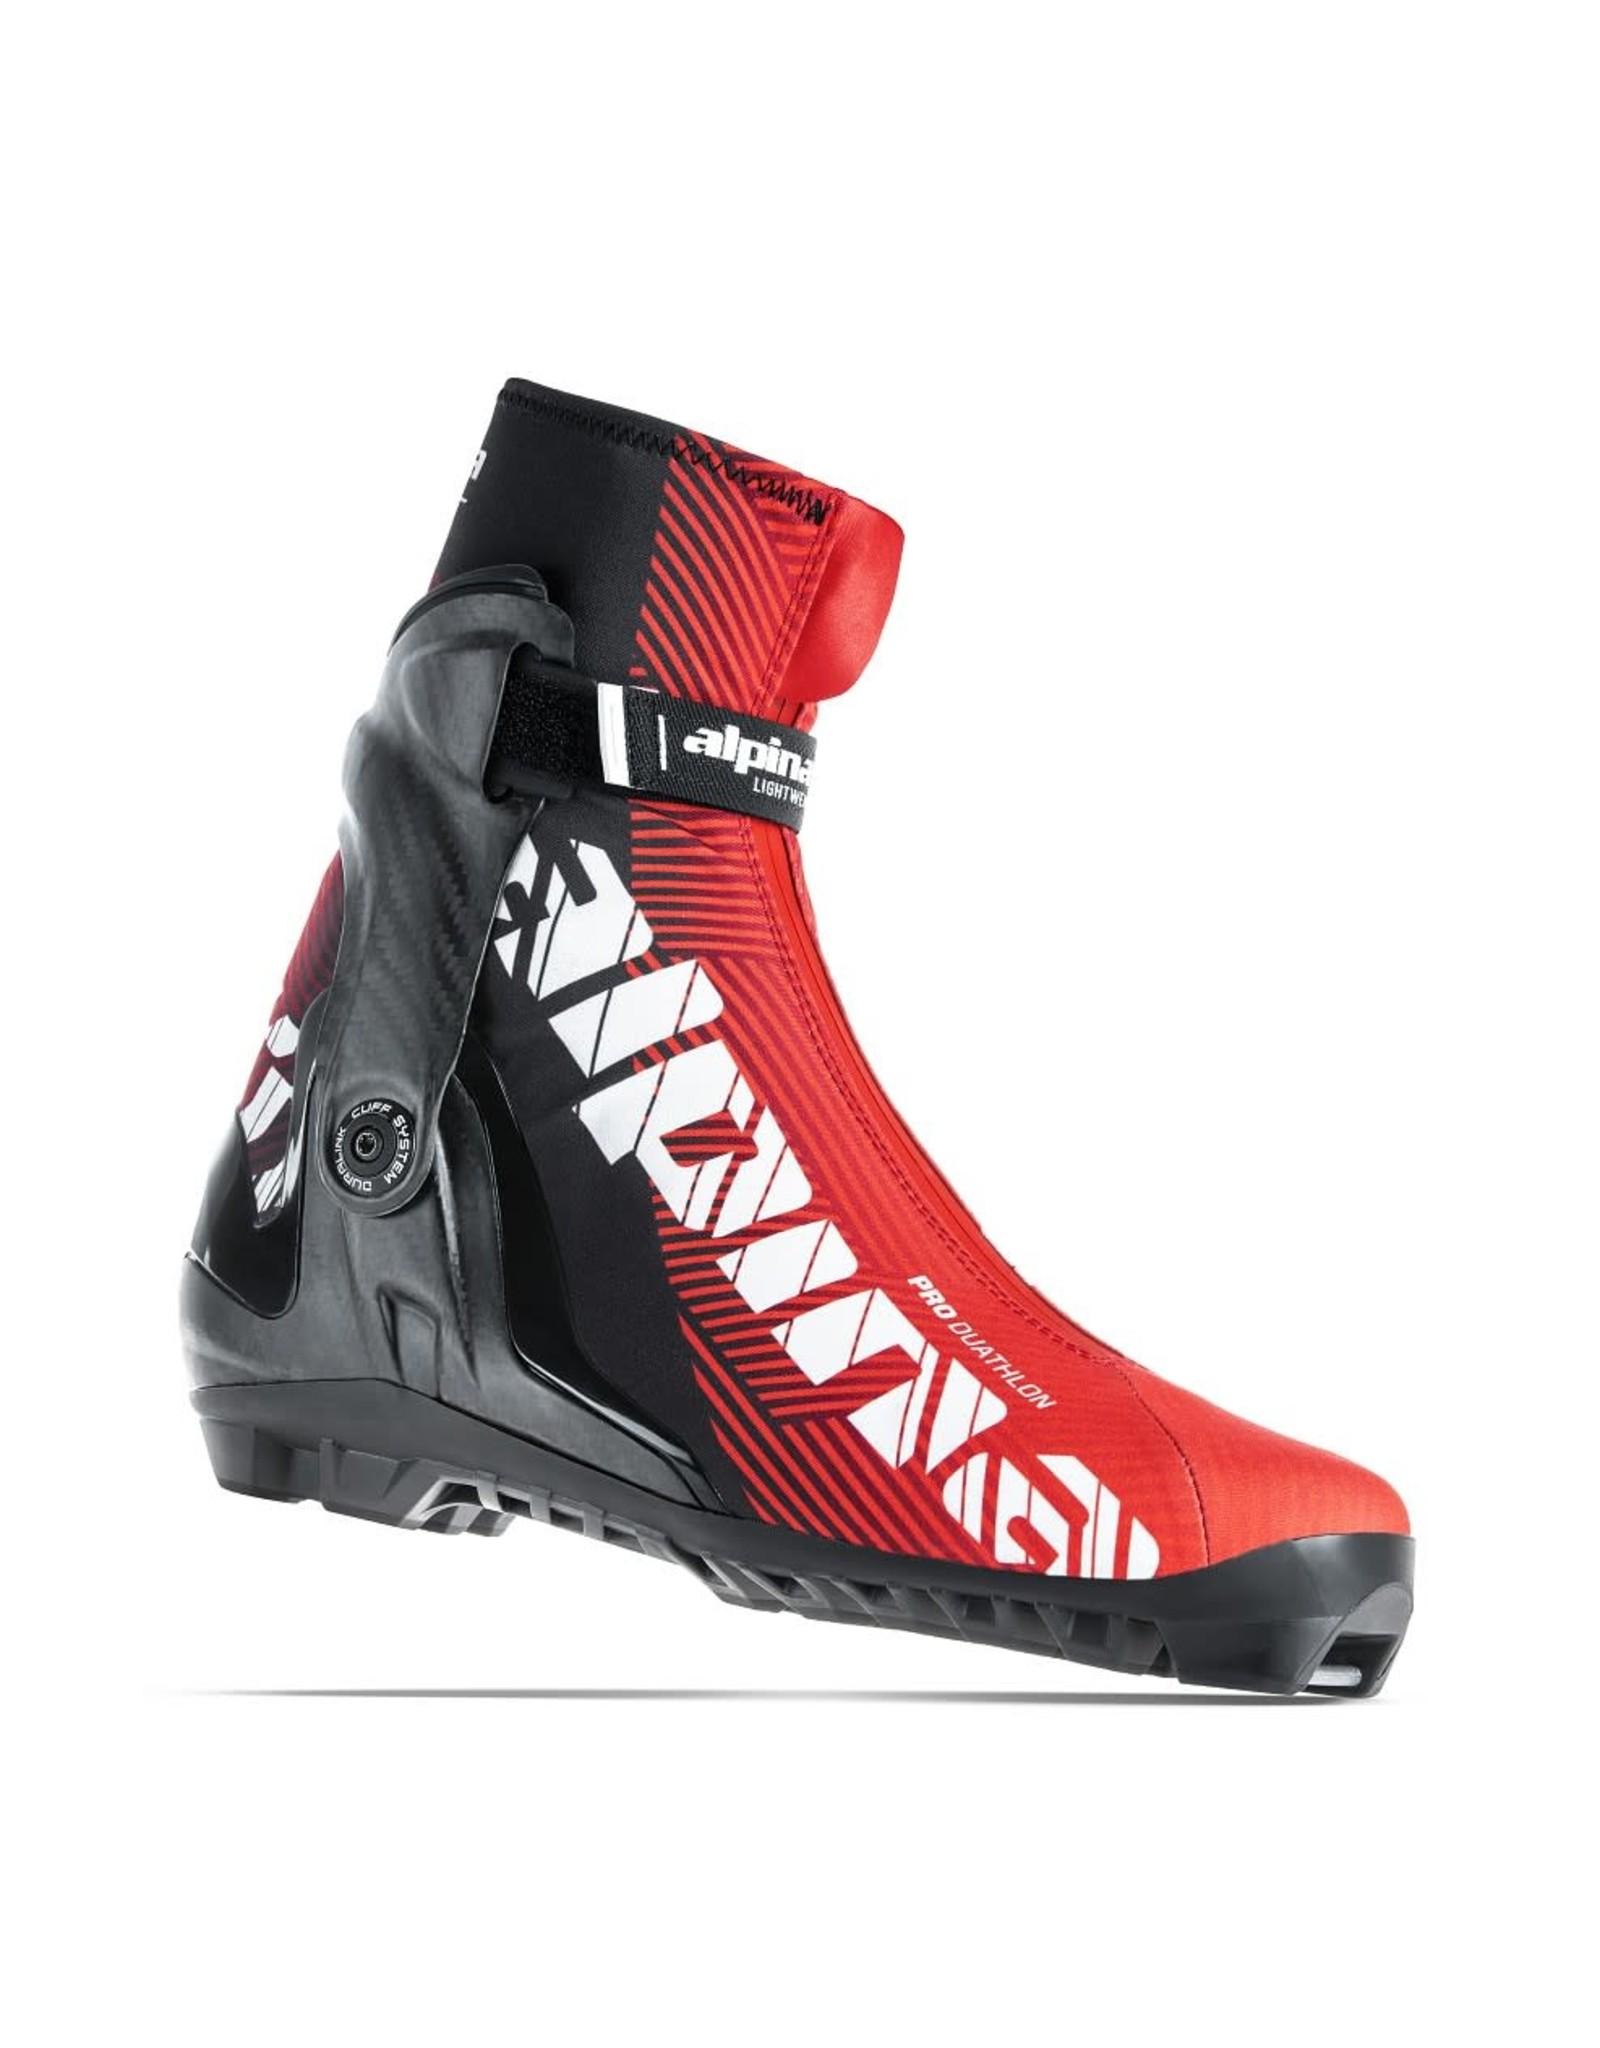 Alpina Alpina Pro Duathlon Boot